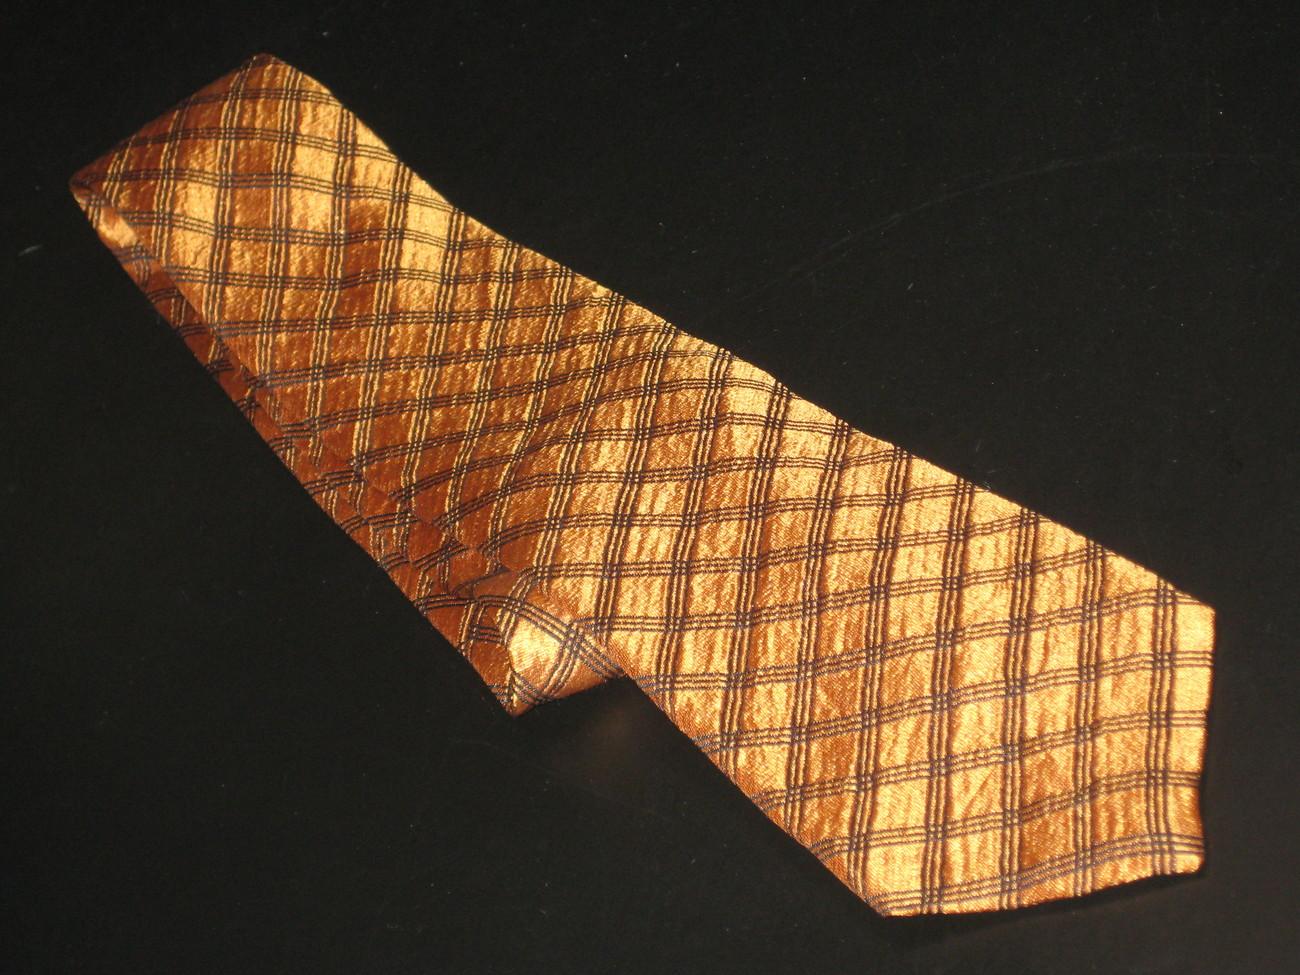 Tie guy laroche diffusion browish orange criss crossing blue lines sheen 10